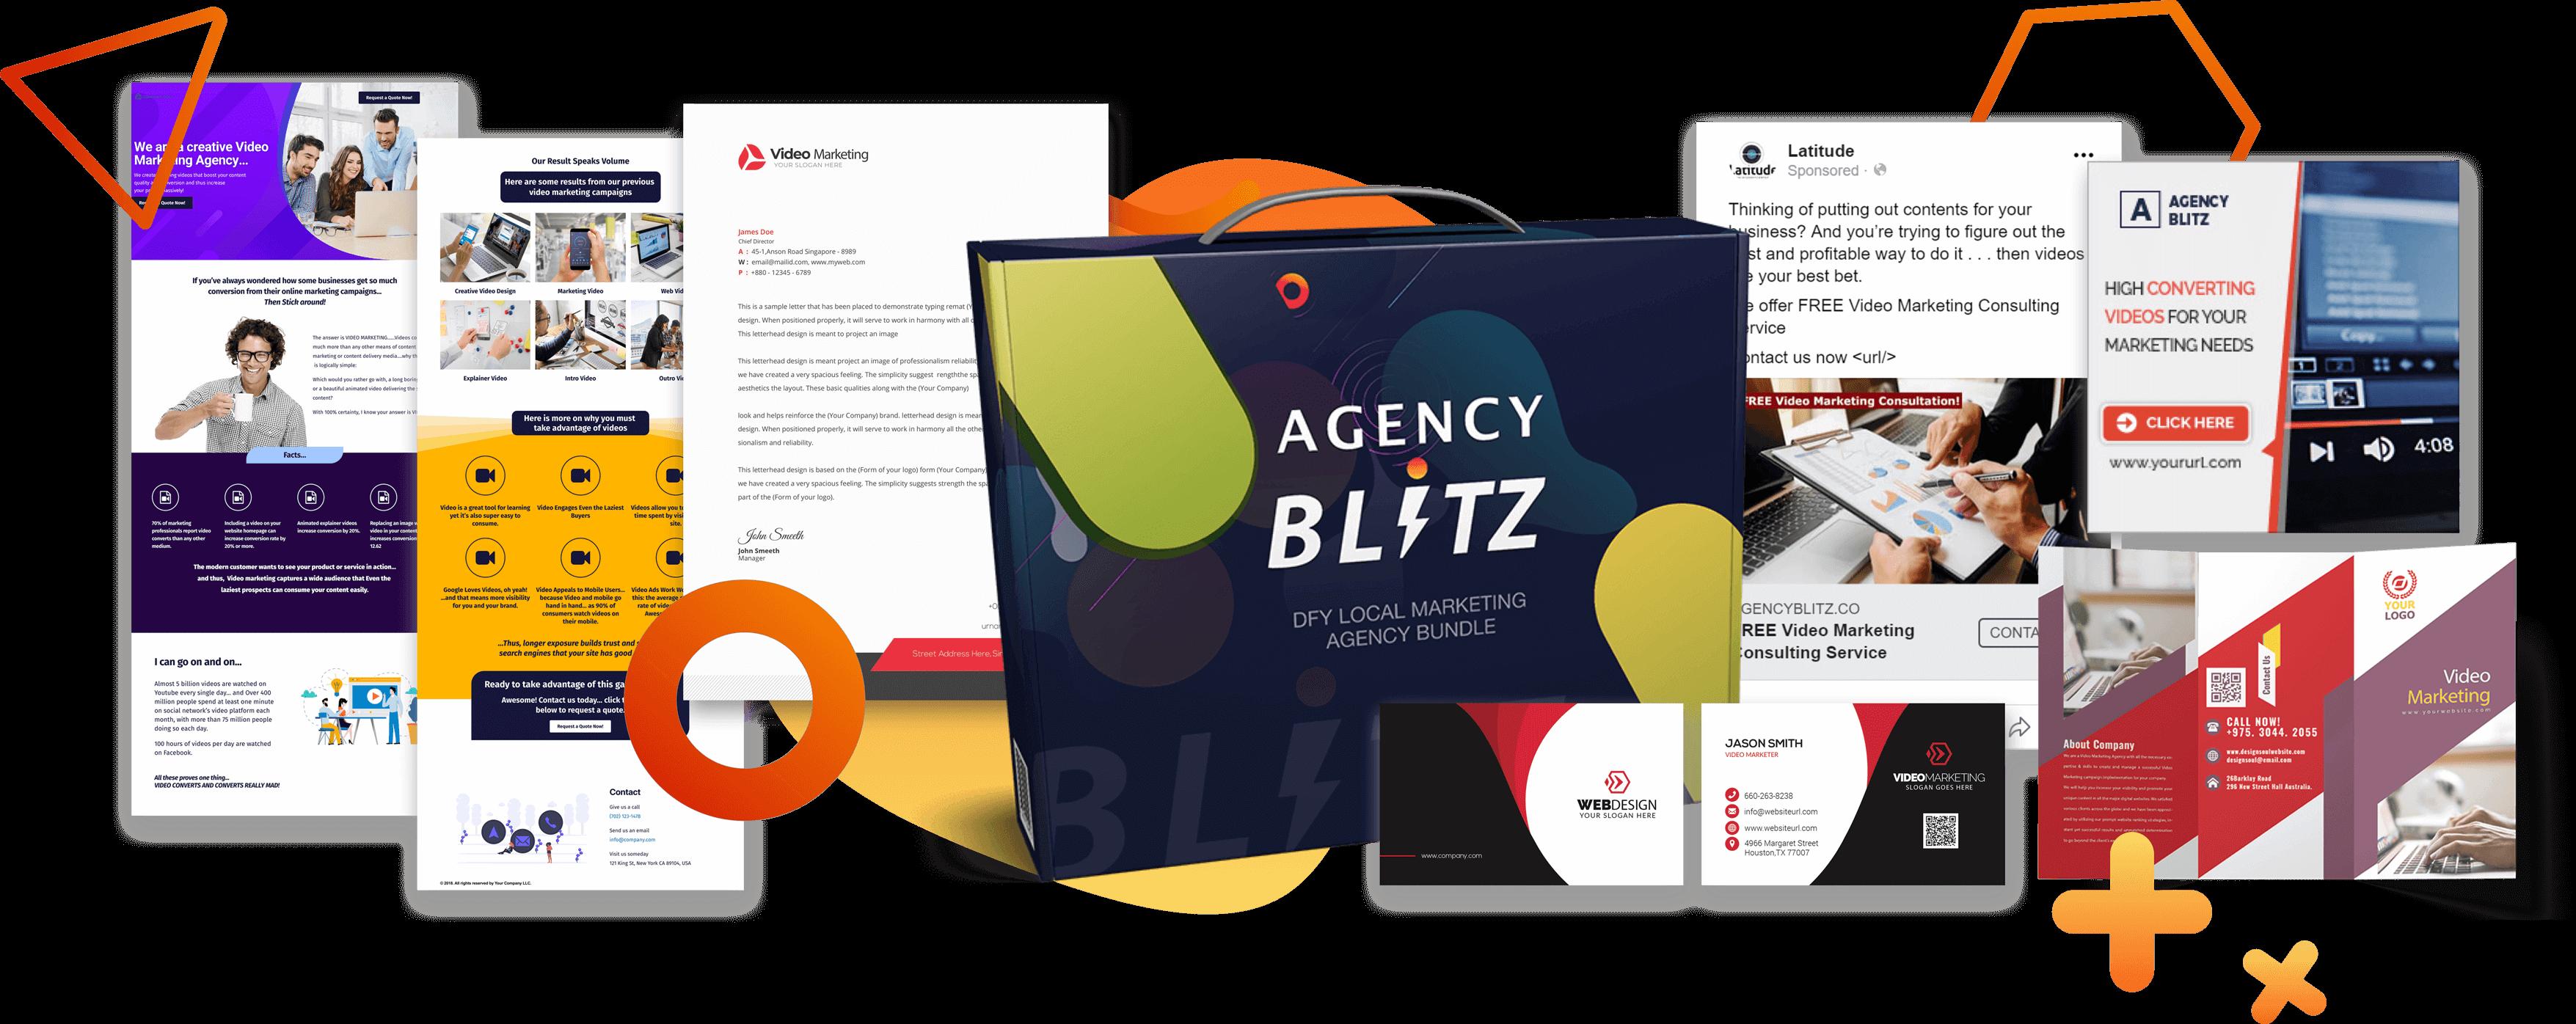 Agency-Blitz-Reviews